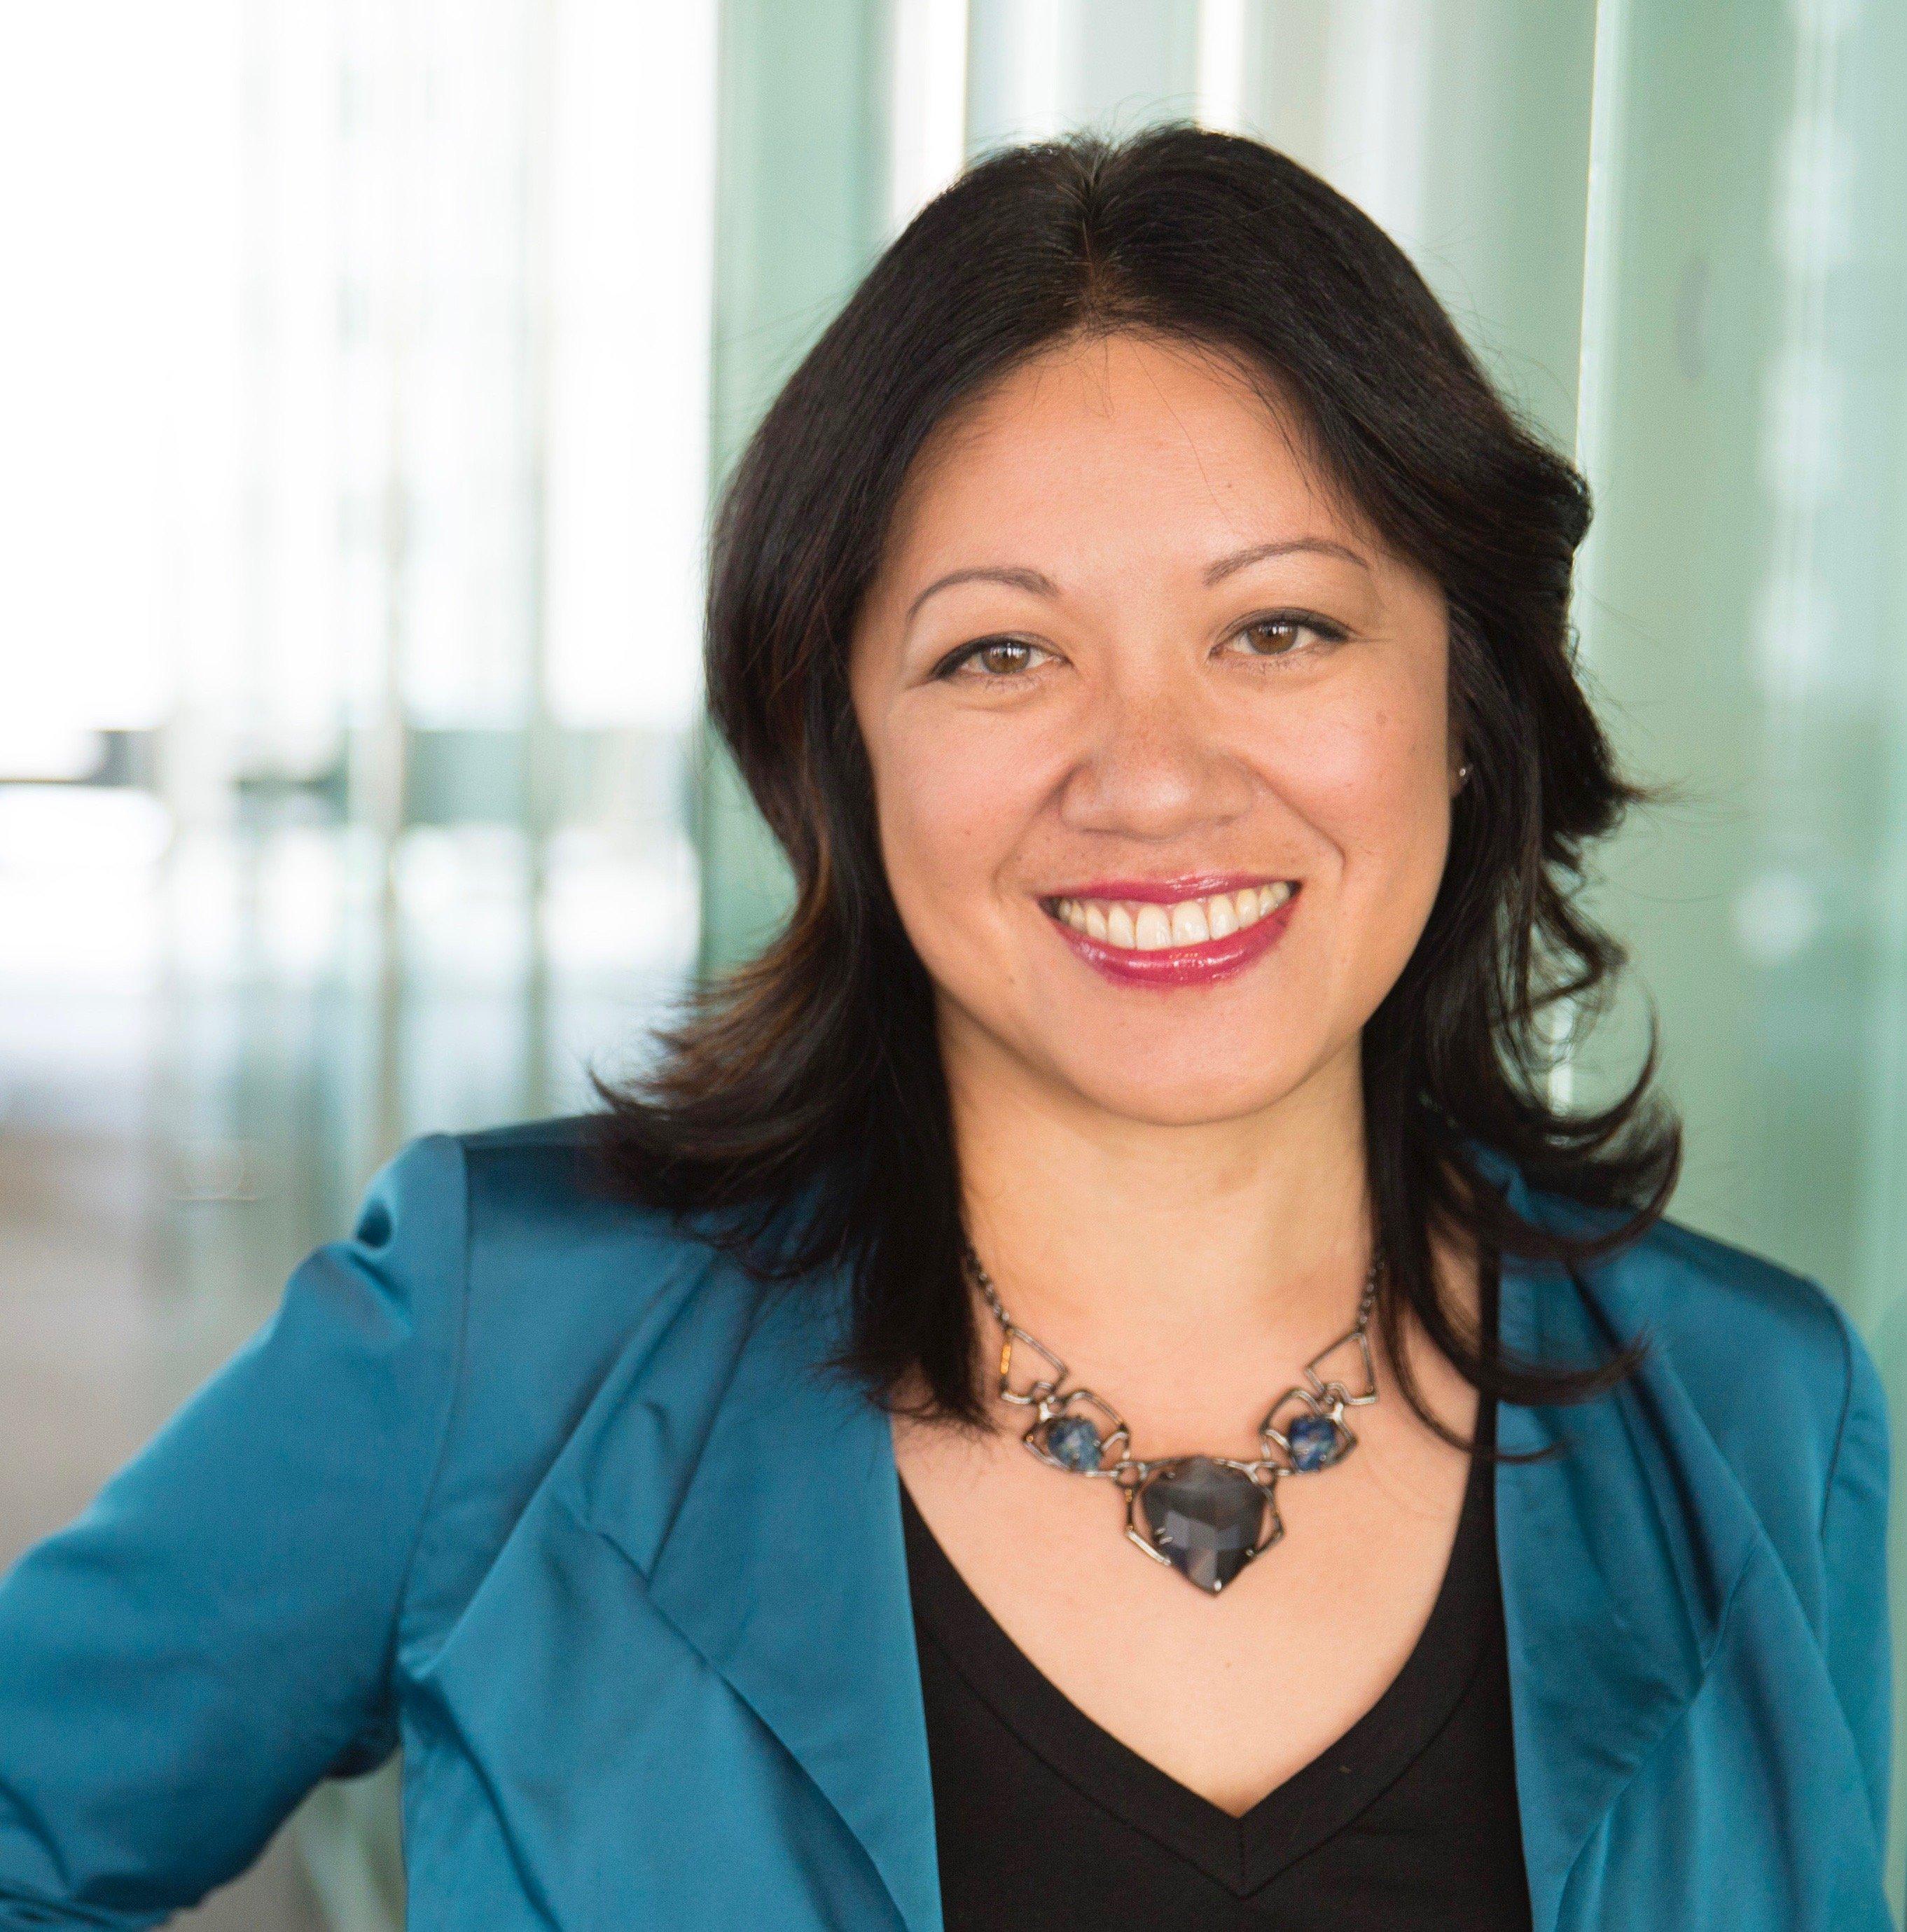 Charlene Li Square